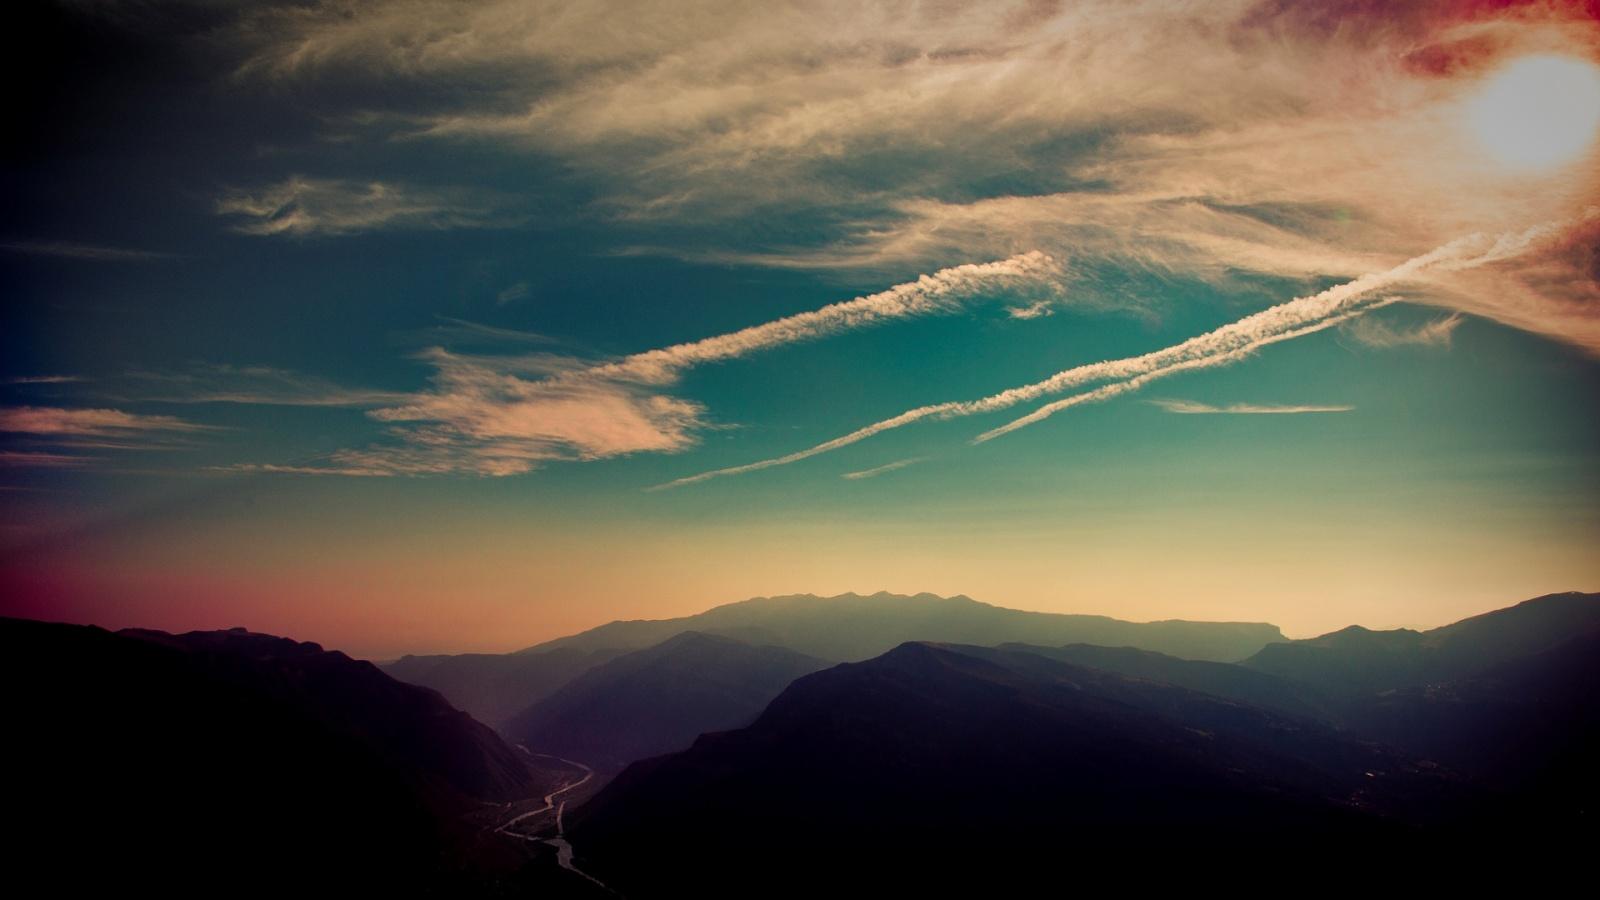 sky wallpaper 1600 x 900 - photo #13